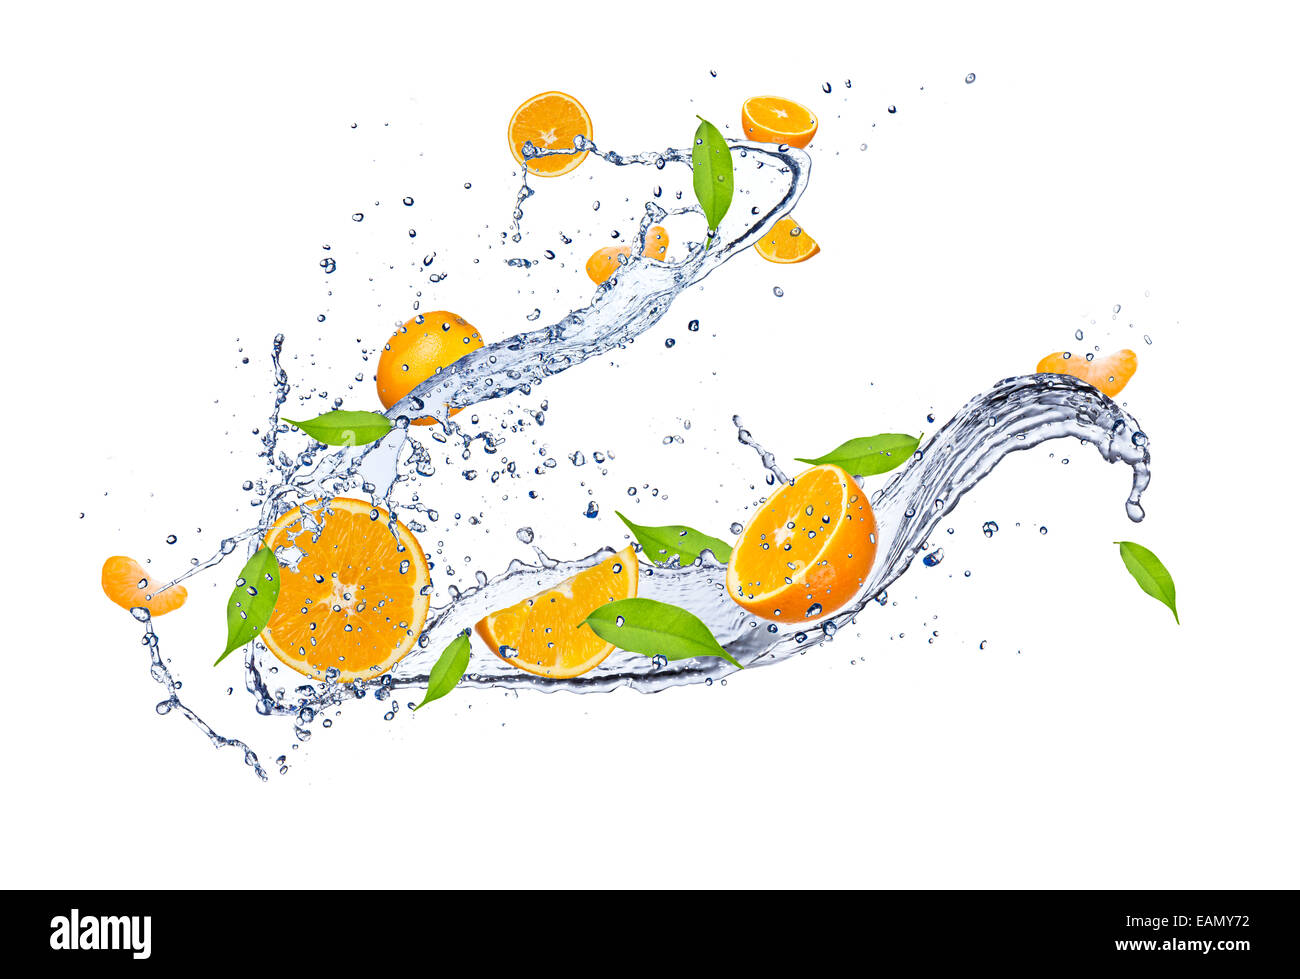 Fresh oranges in water splash, isolated on white background - Stock Image